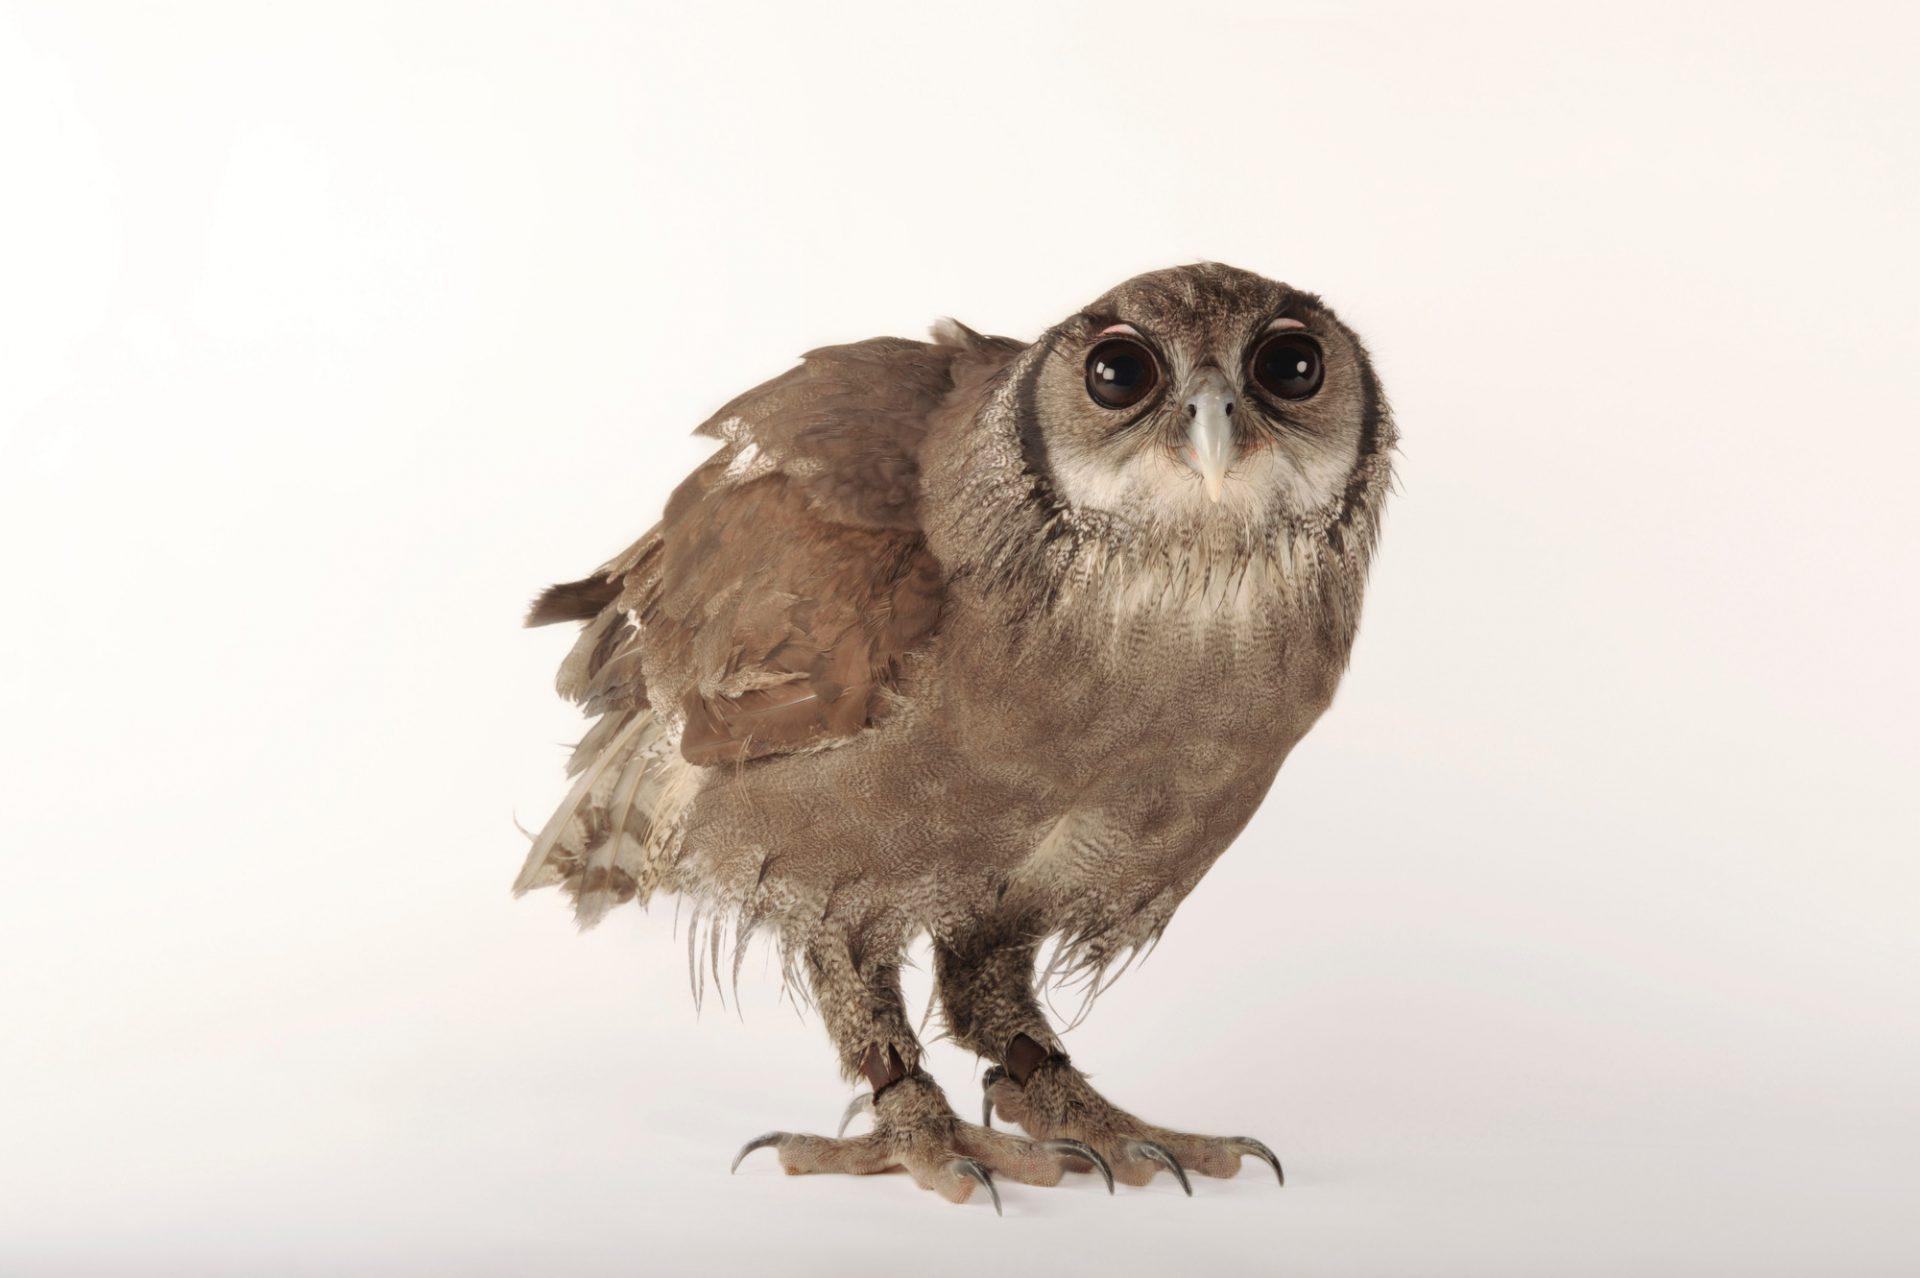 Picture of a milky eagle owl (Bubo lacteus) at Zoo Atlanta.